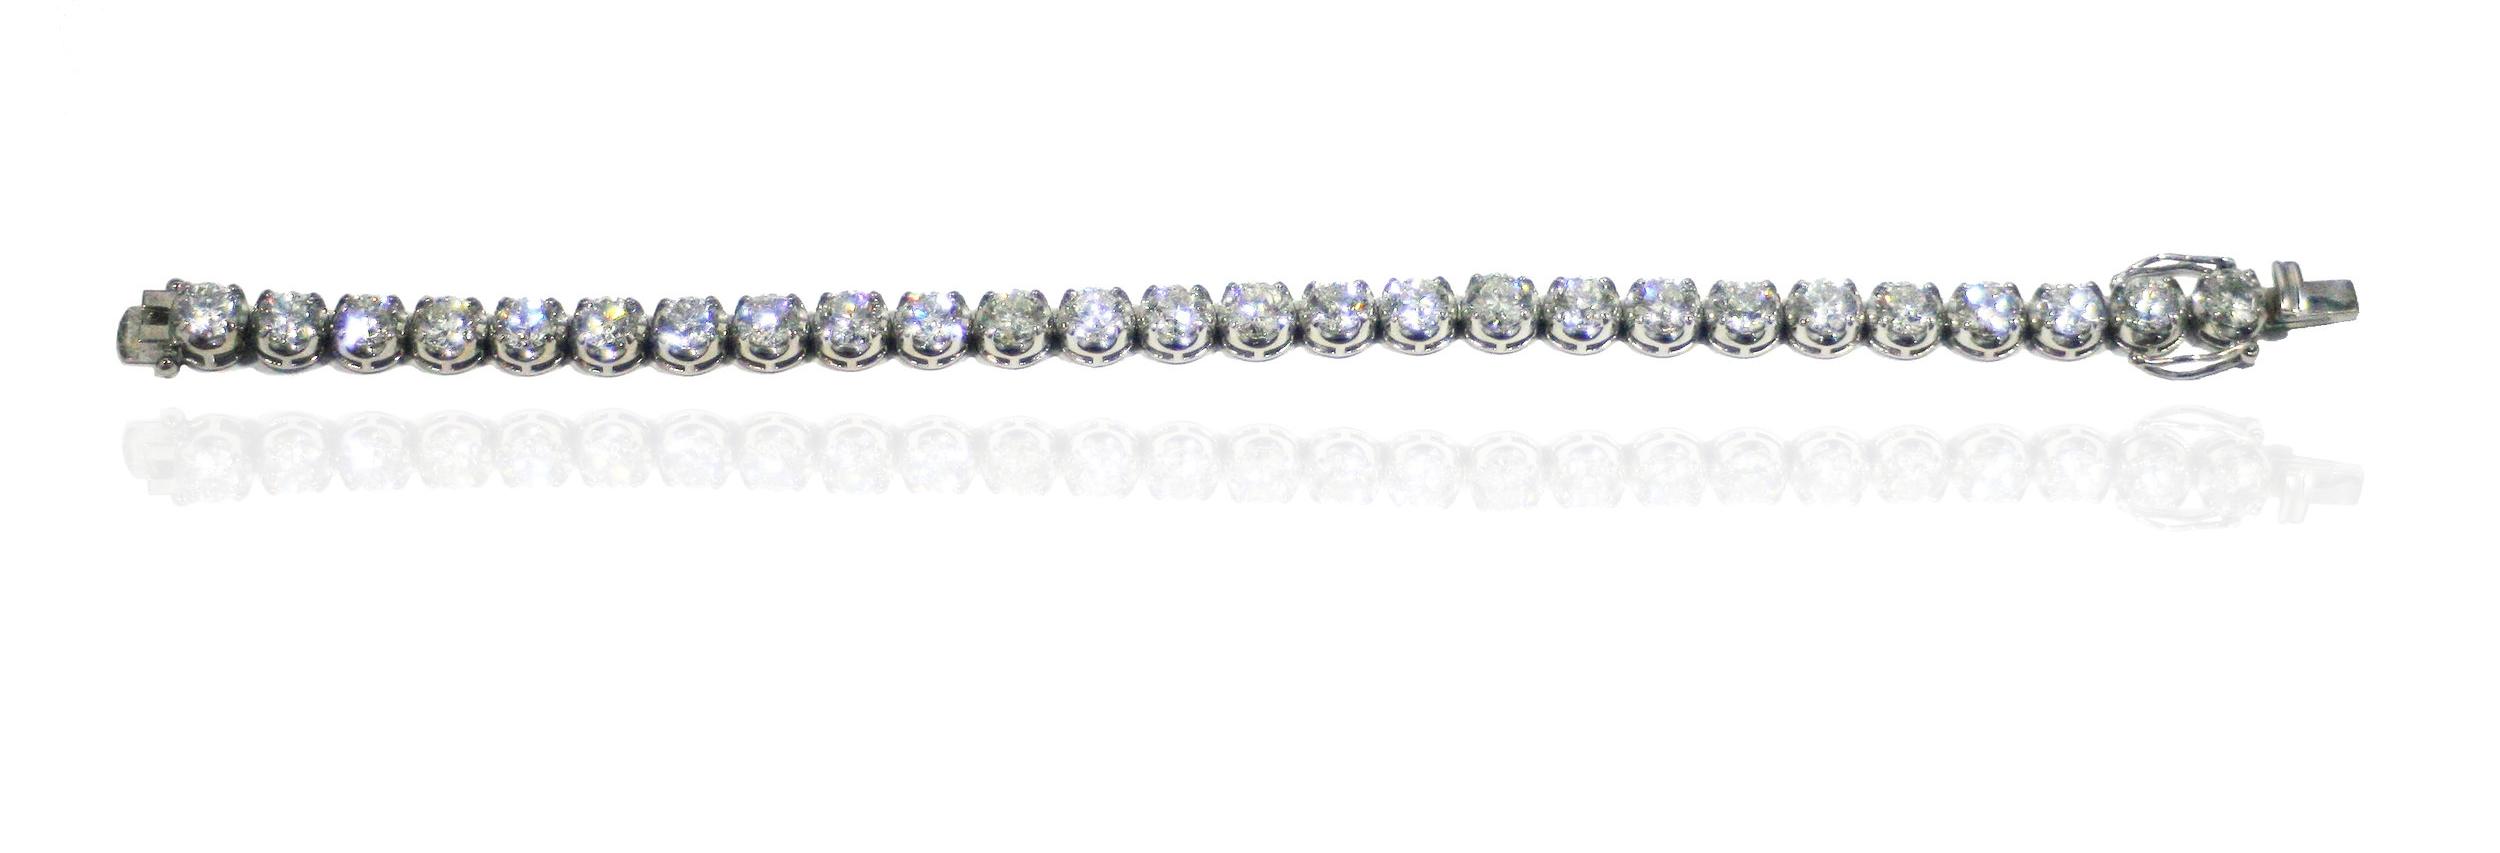 26 diamond tennis bracelet shadow.jpg